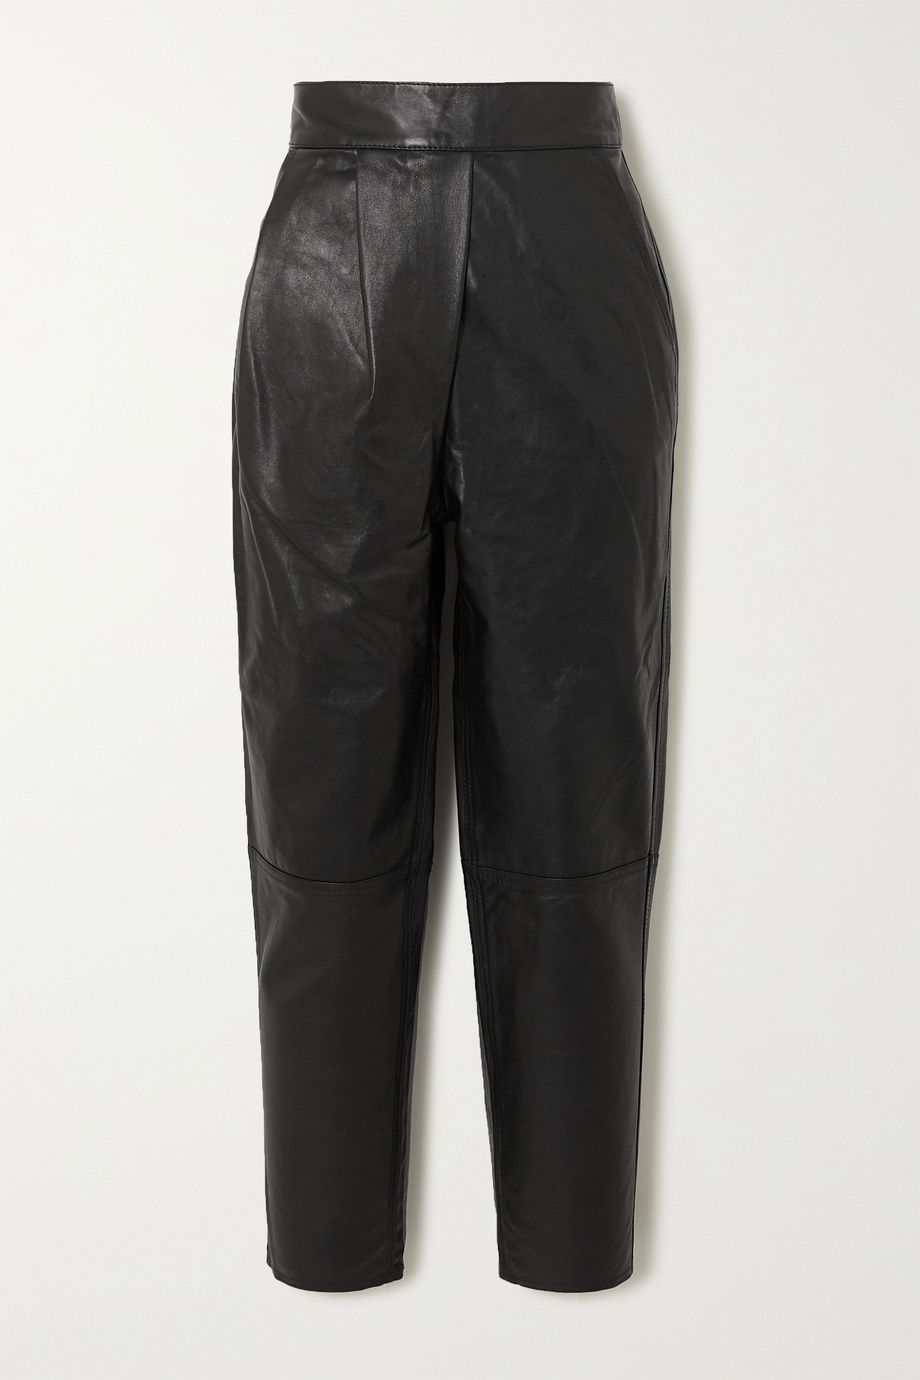 Johanna Ortiz Crossing Legacies leather tapered pants